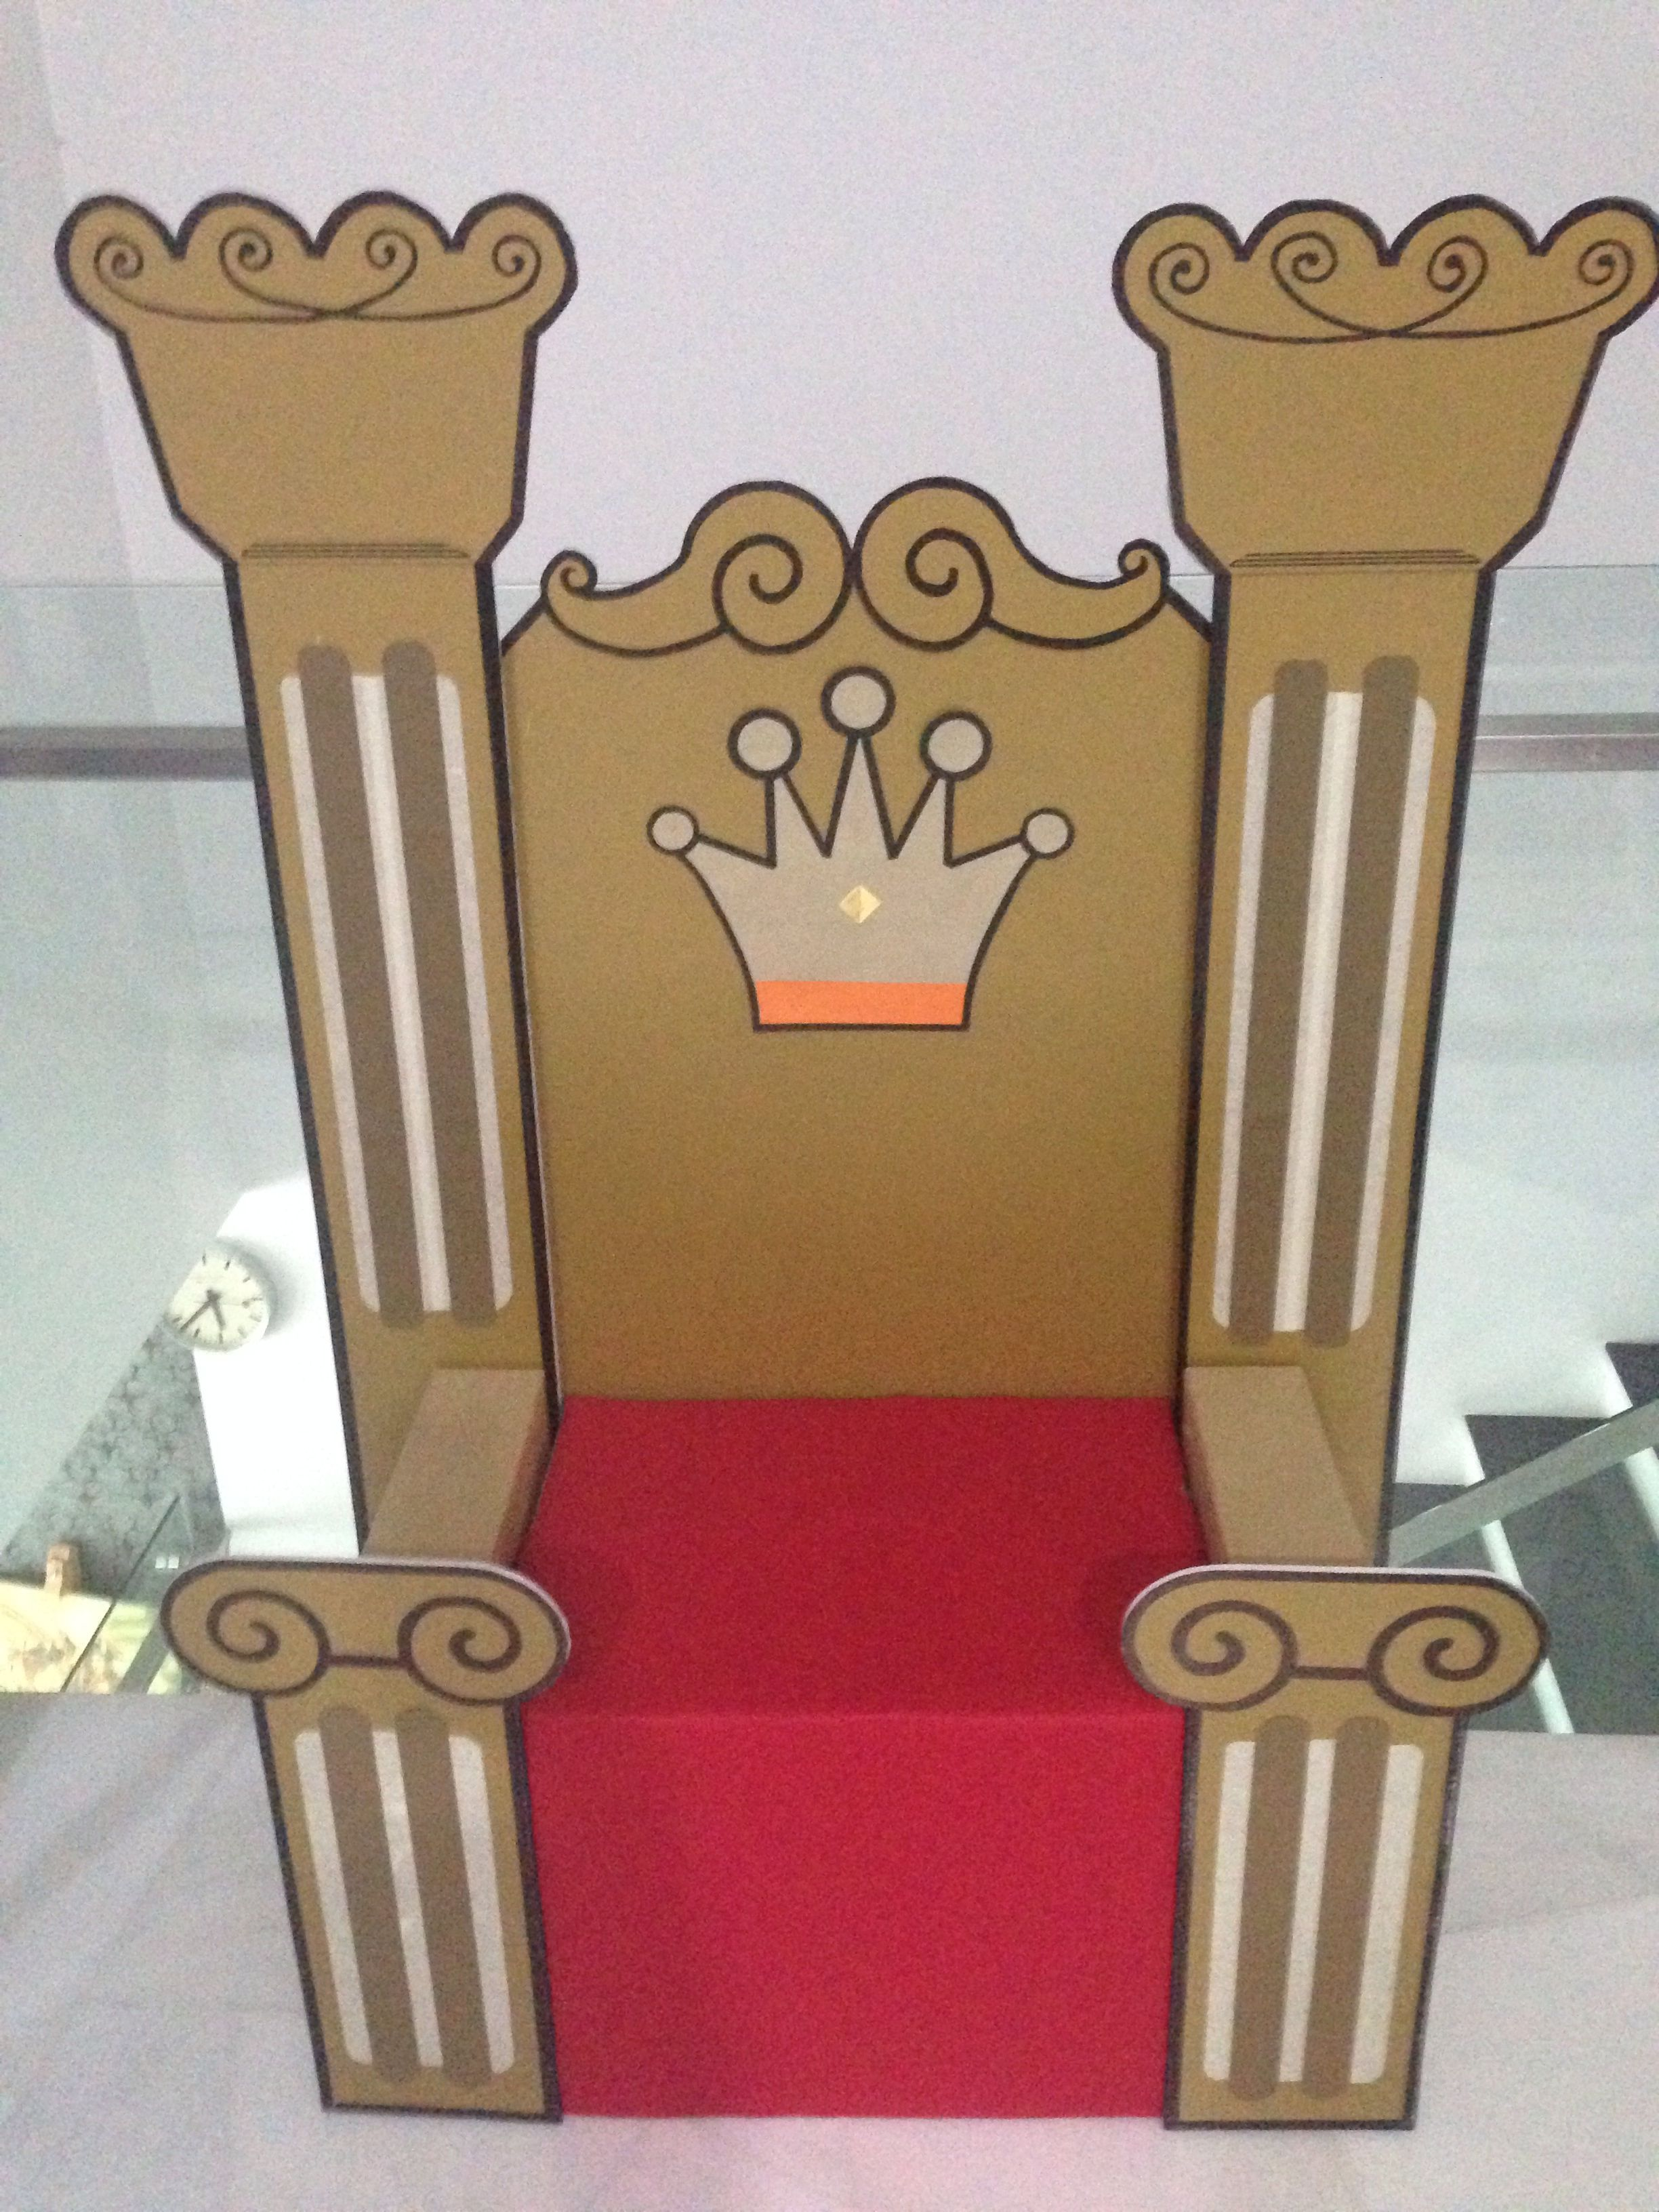 Speech Amp Drama Props King Throne Chair Throne Chair King Chair King On Throne